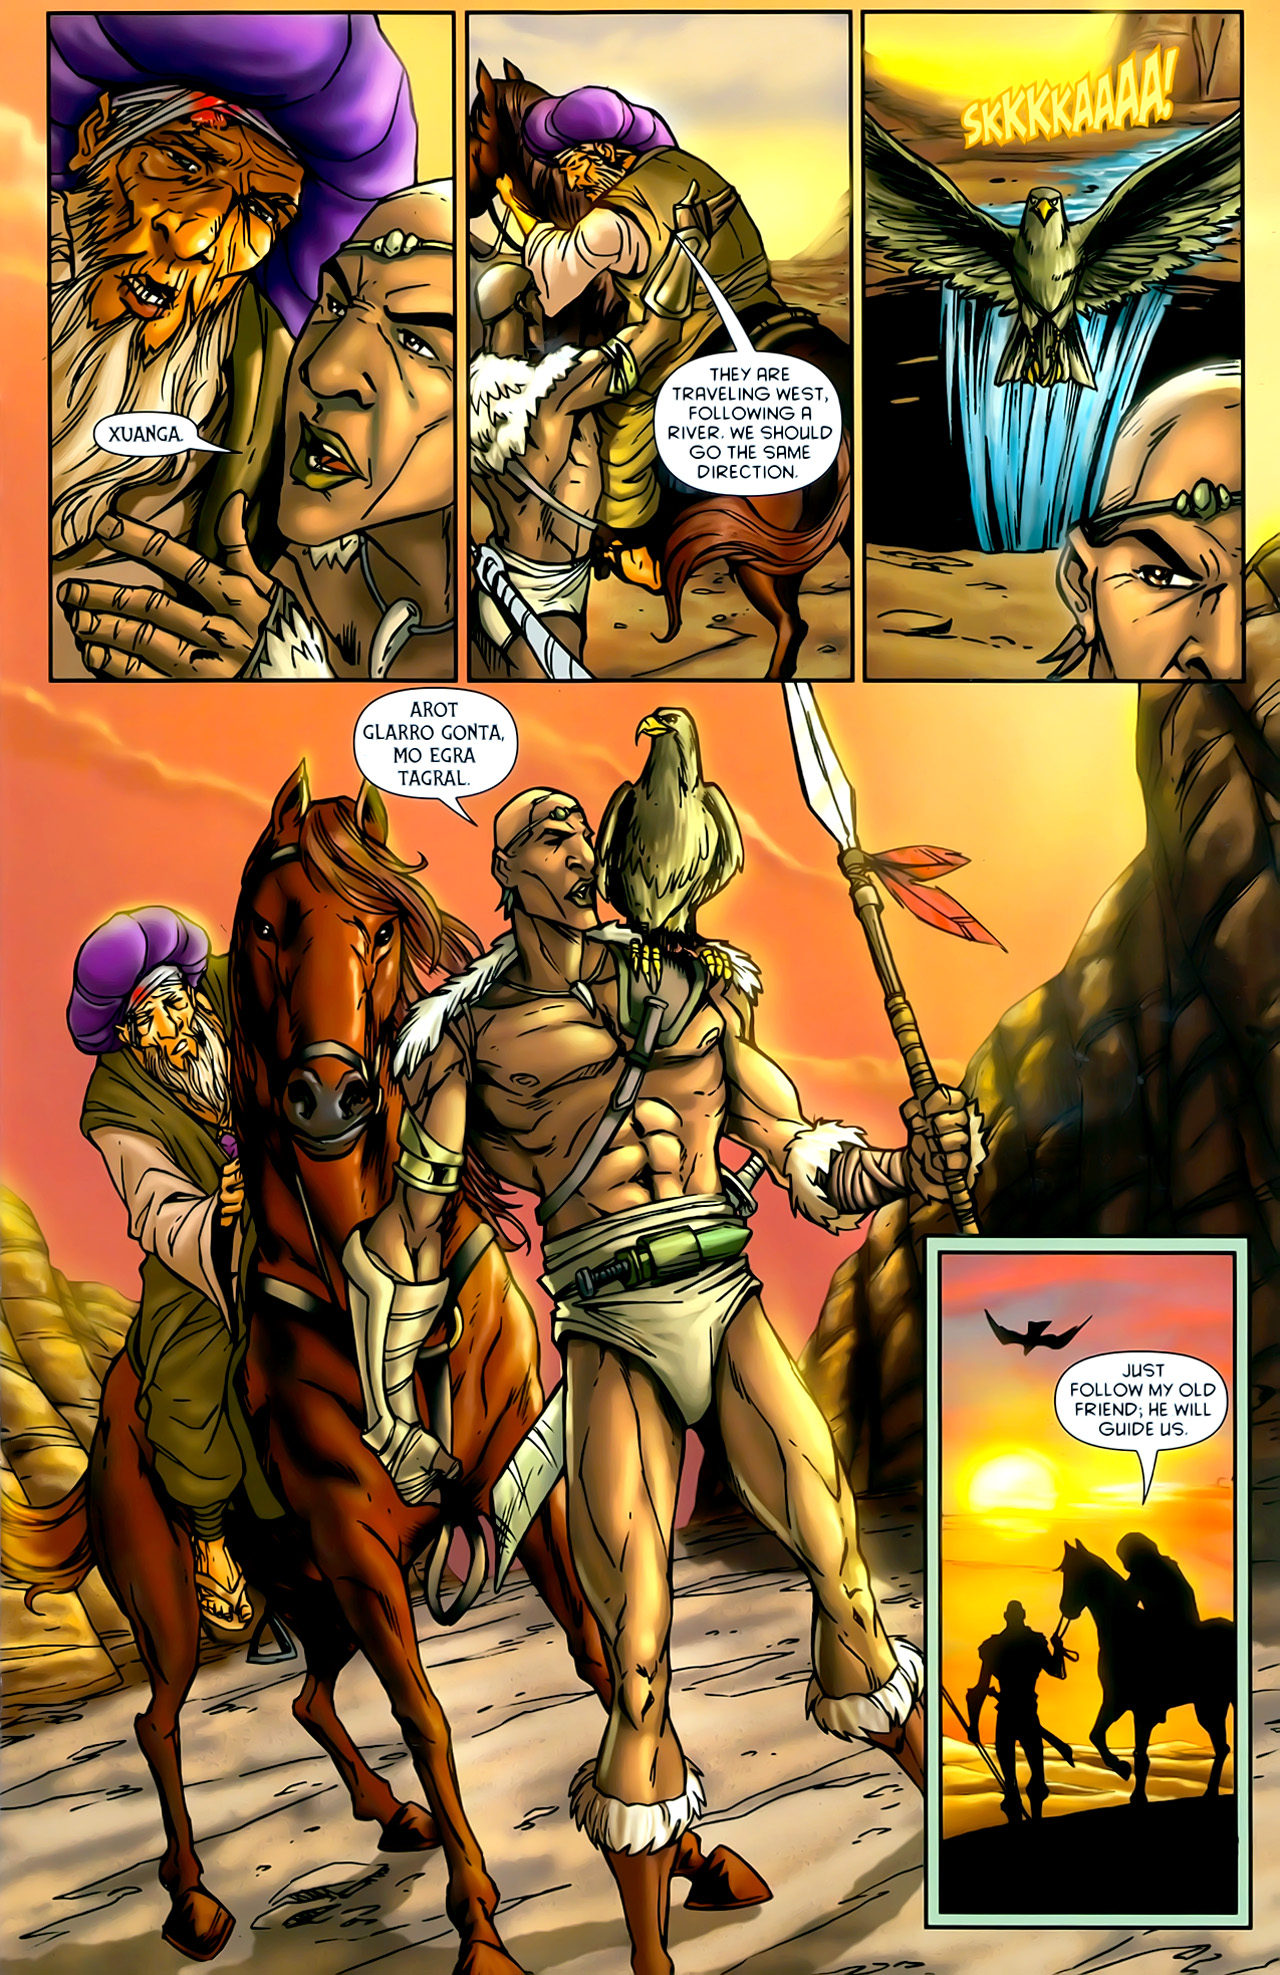 Read online 1001 Arabian Nights: The Adventures of Sinbad comic -  Issue #10 - 7